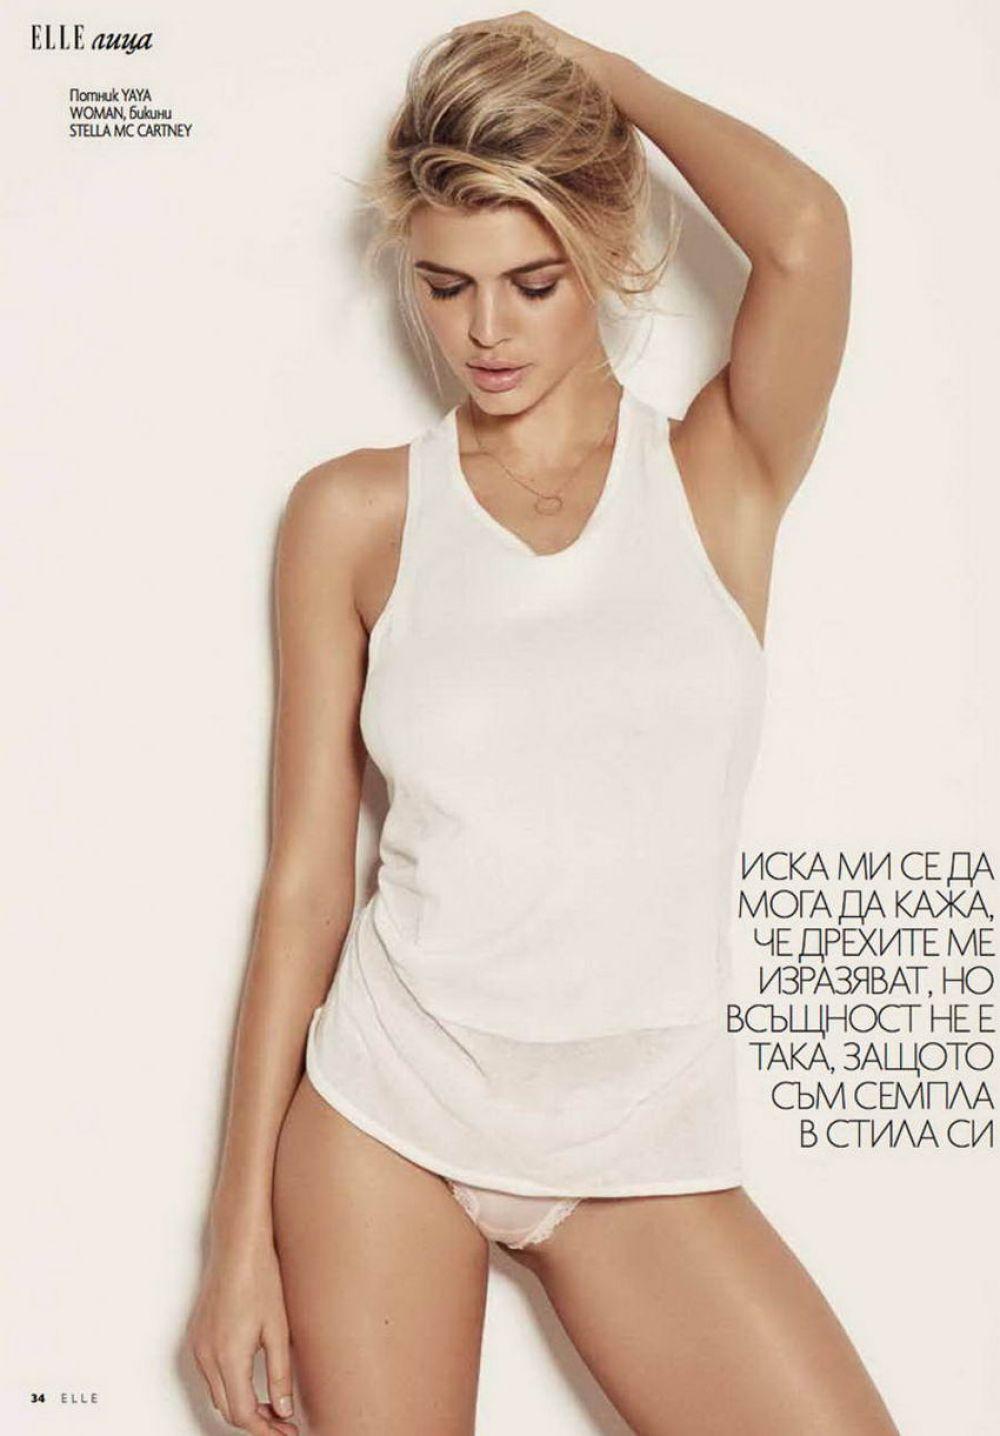 KELLY ROHRBACH in Elle Magazine, Bulgary February 2016 Issue